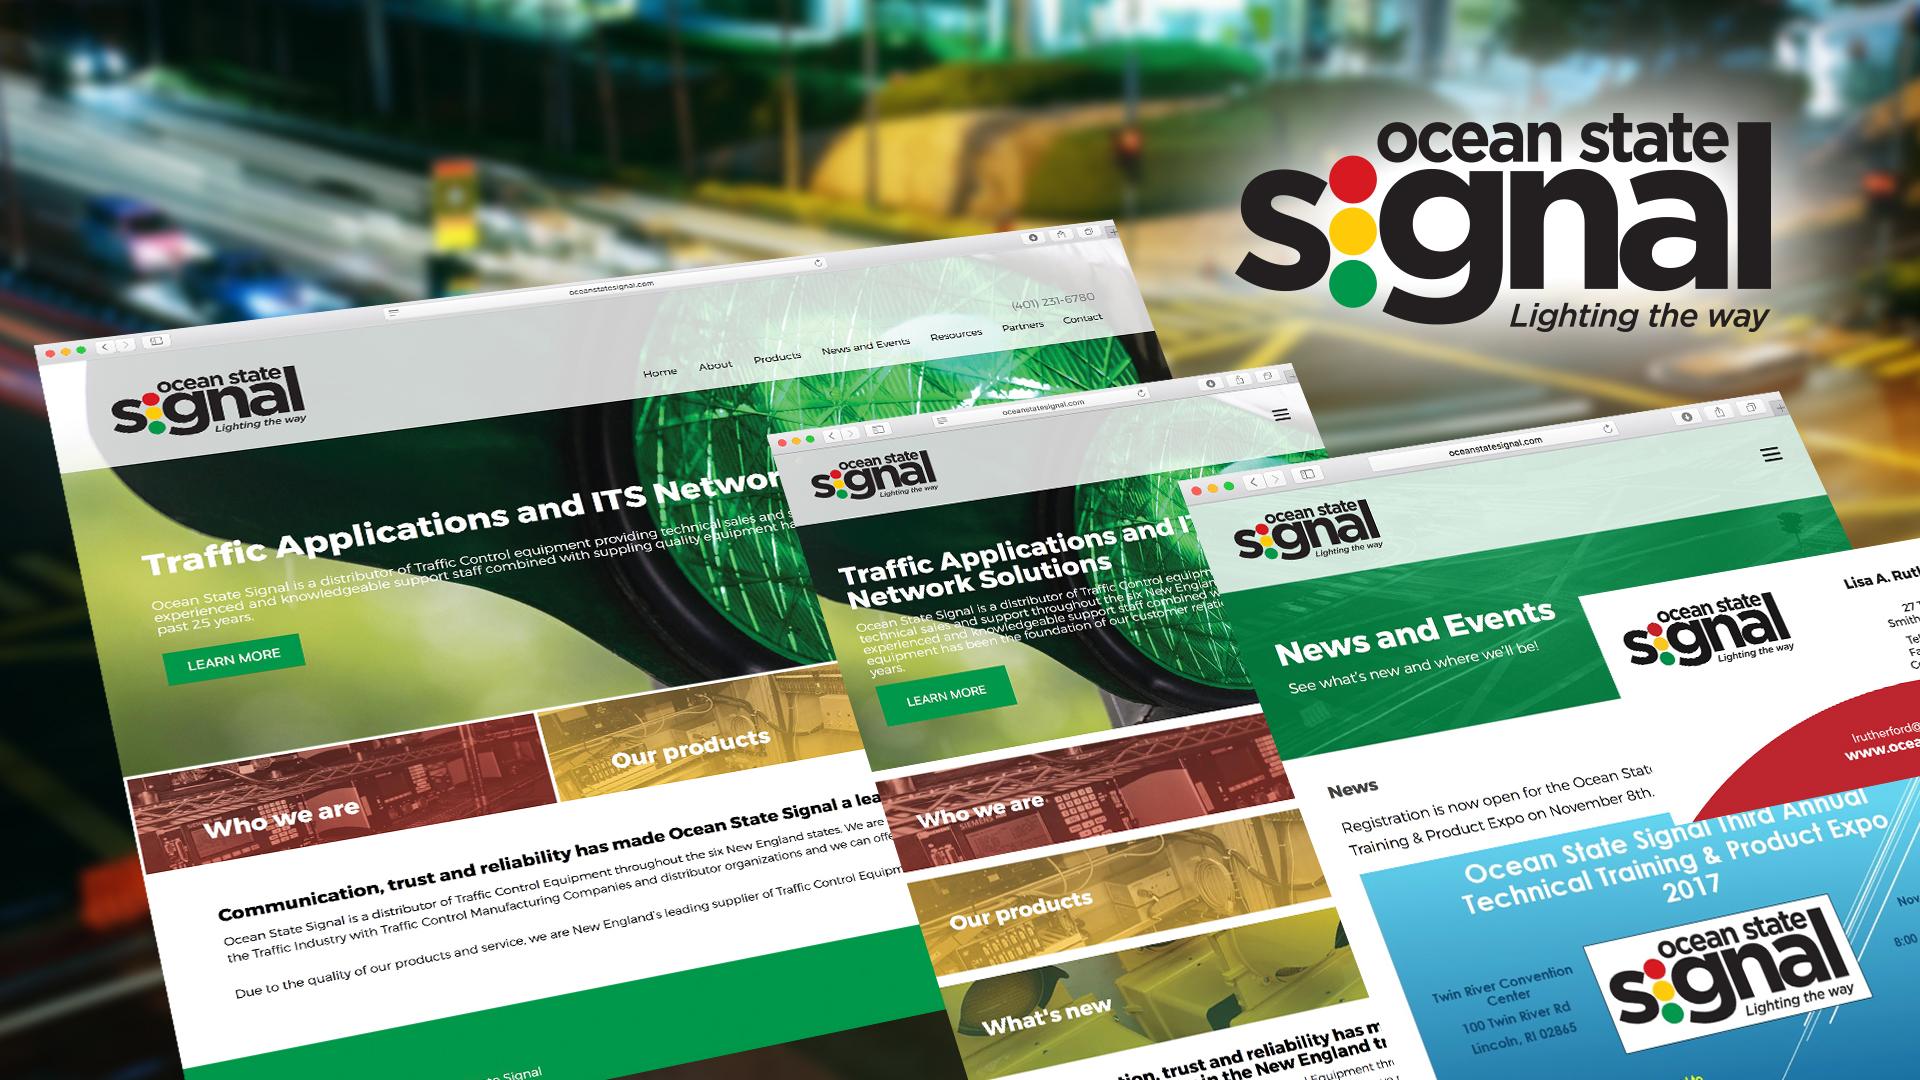 Ocean State Signal.jpg